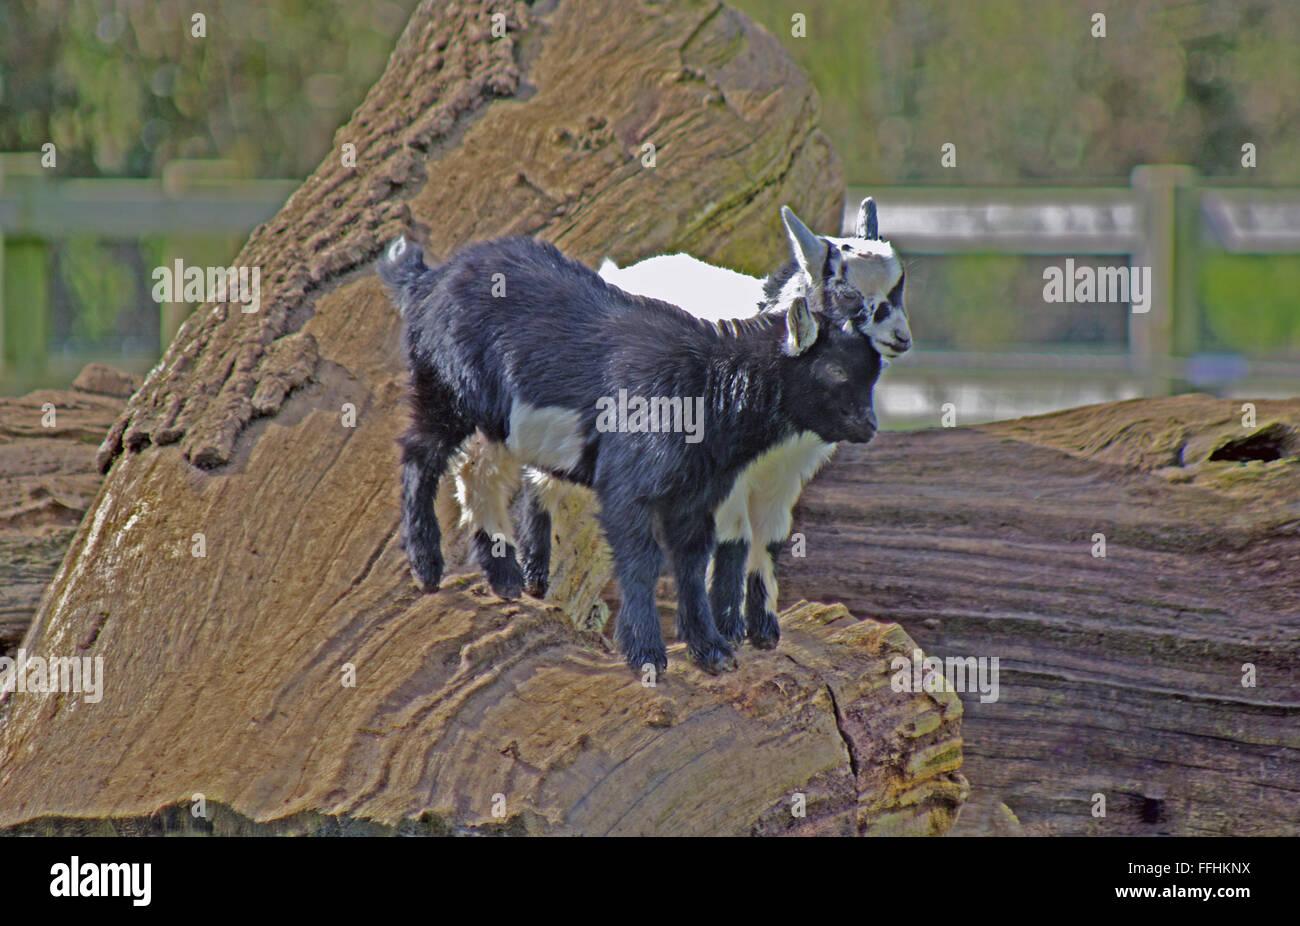 Pygmy Goats, - Stock Image